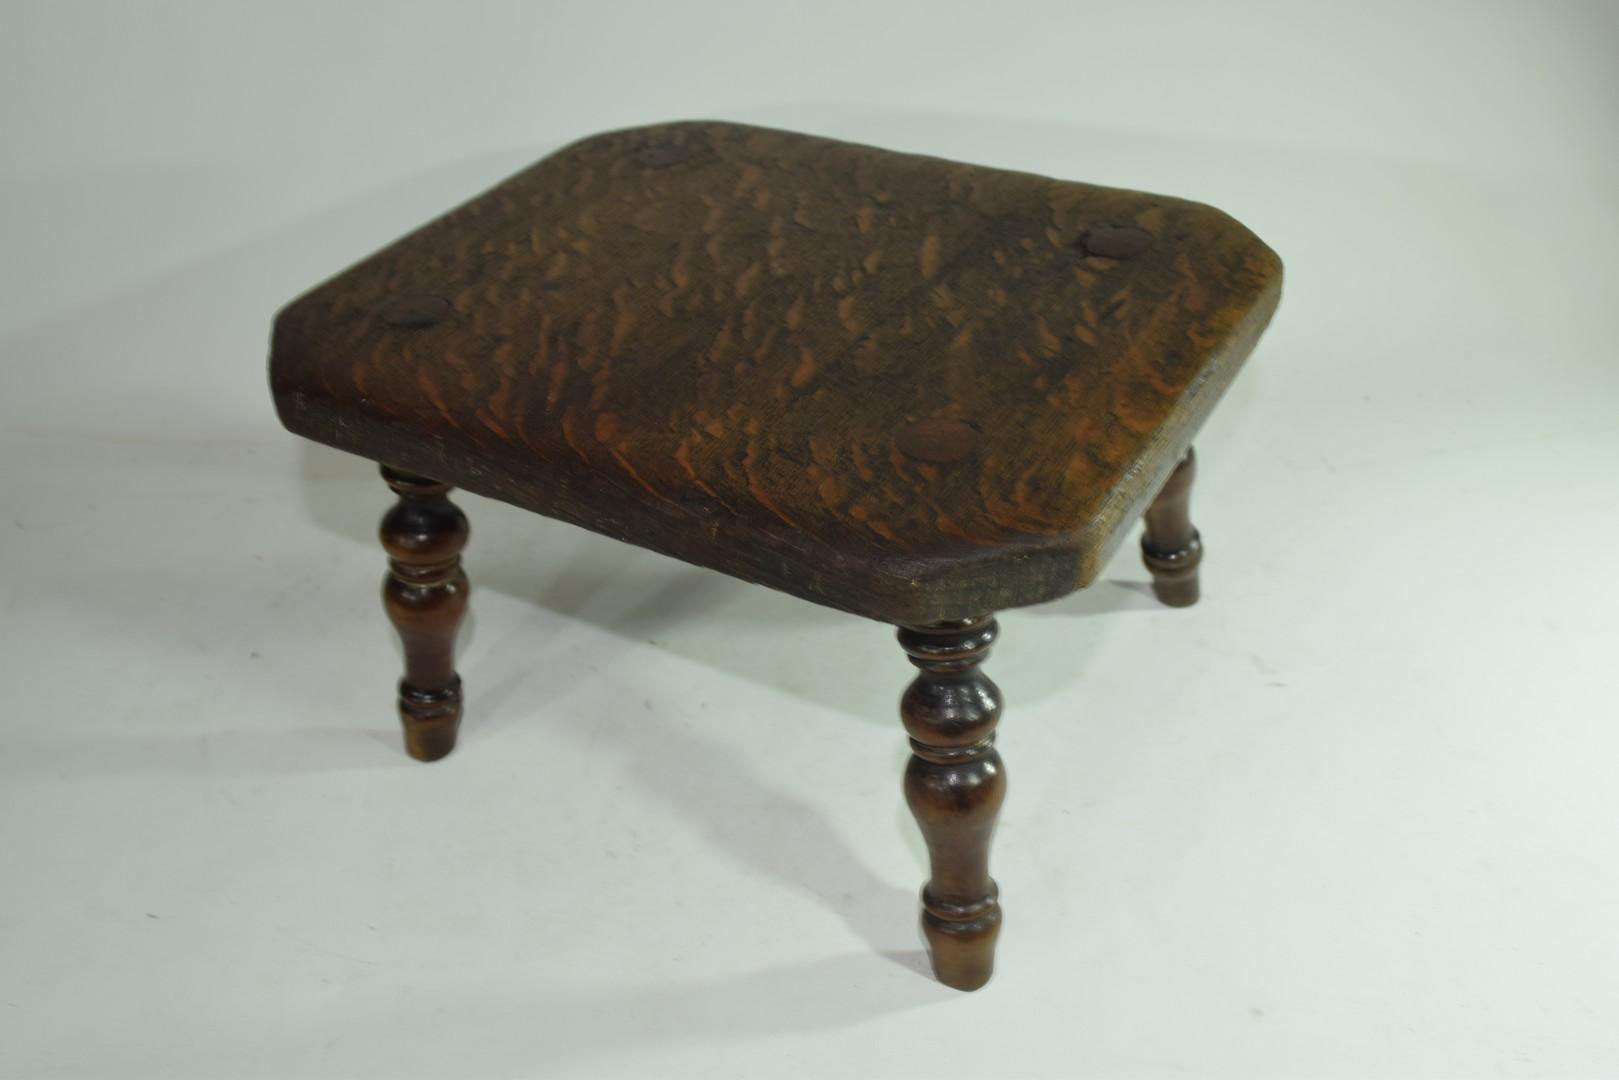 Late 19th century oak four legged milking stool - Image 2 of 3